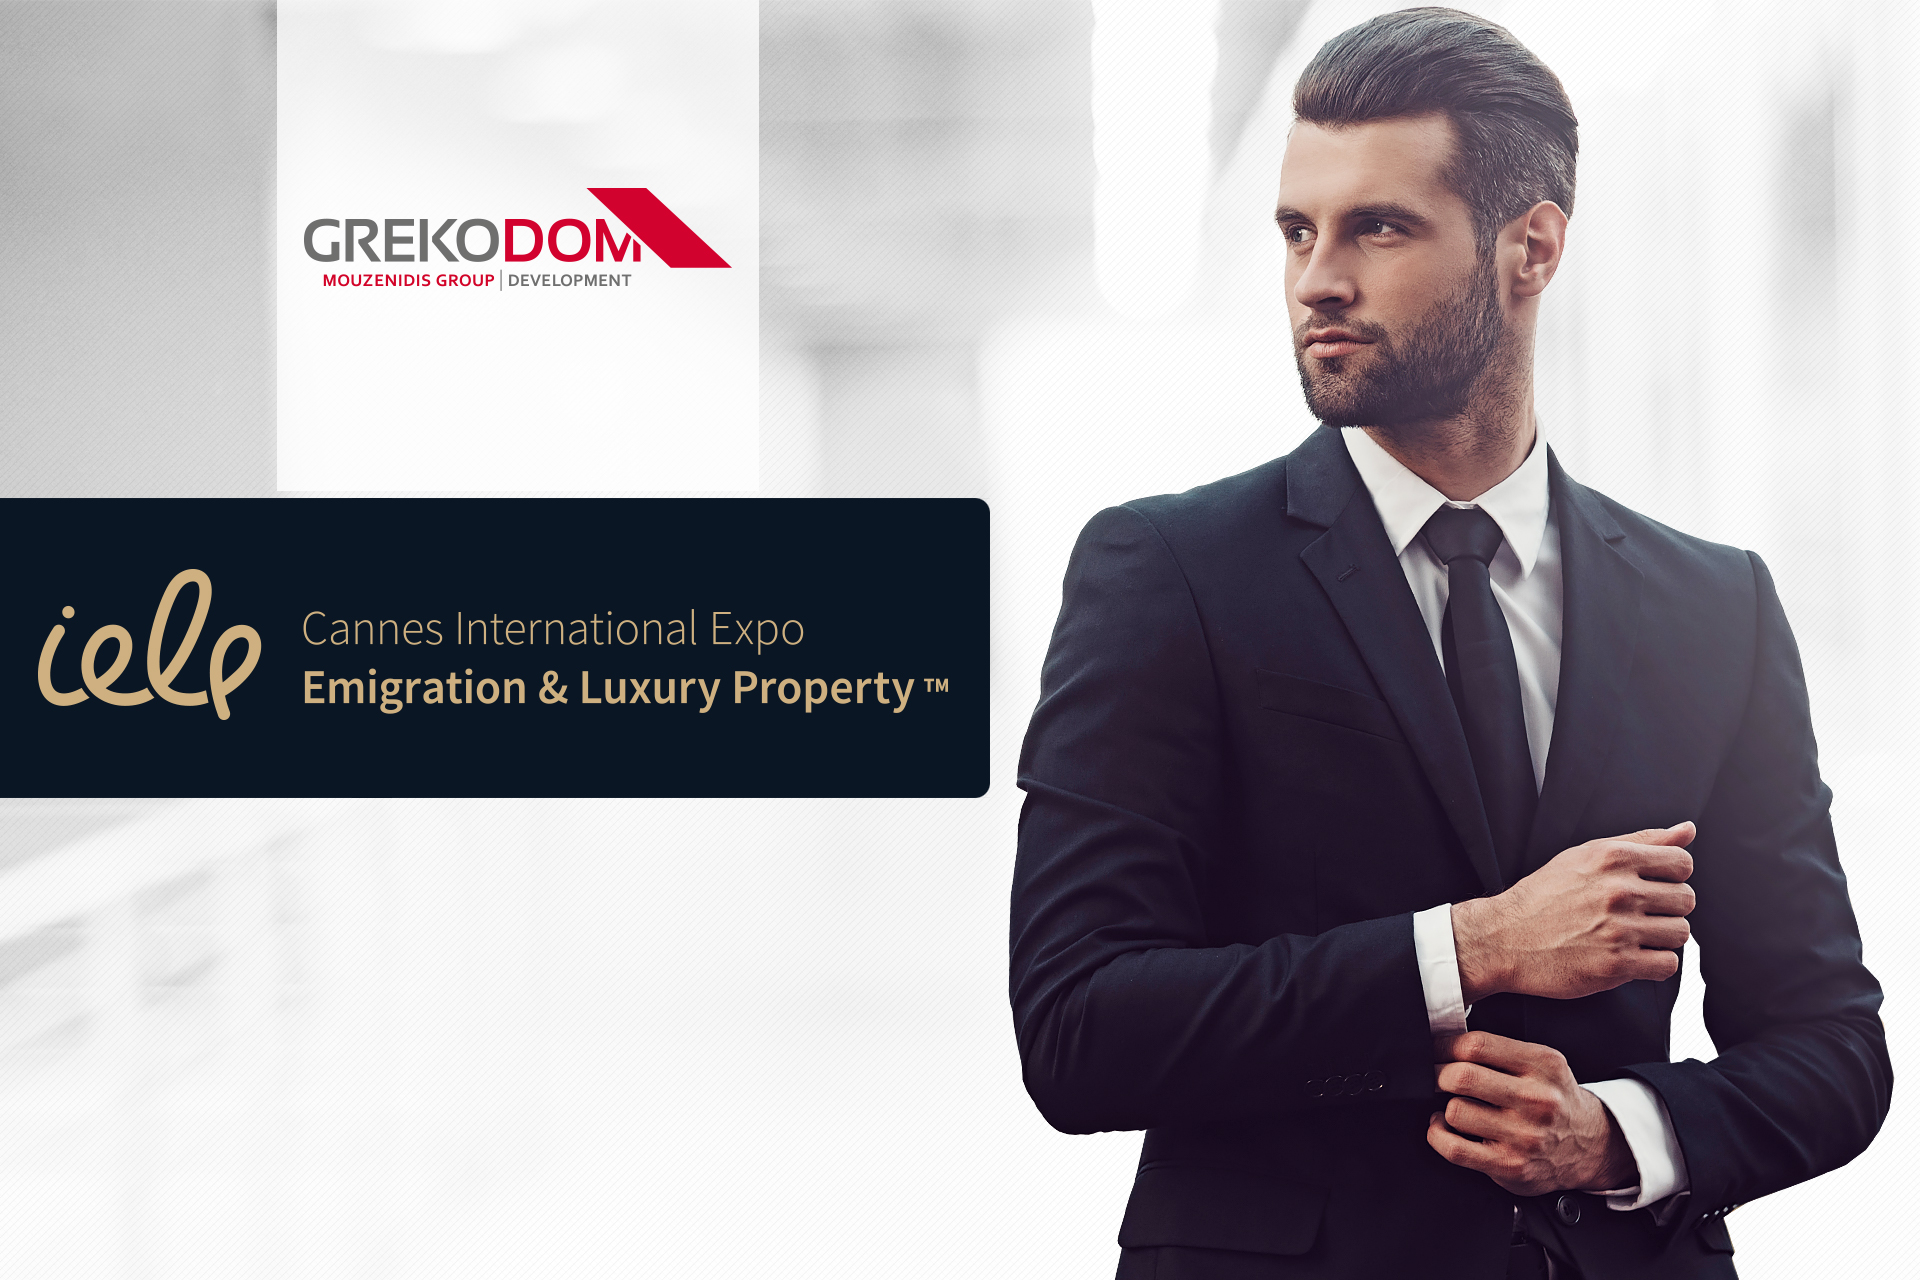 Міжнародна виставка Cannes International Emigration & Luxury Property Expo 2017